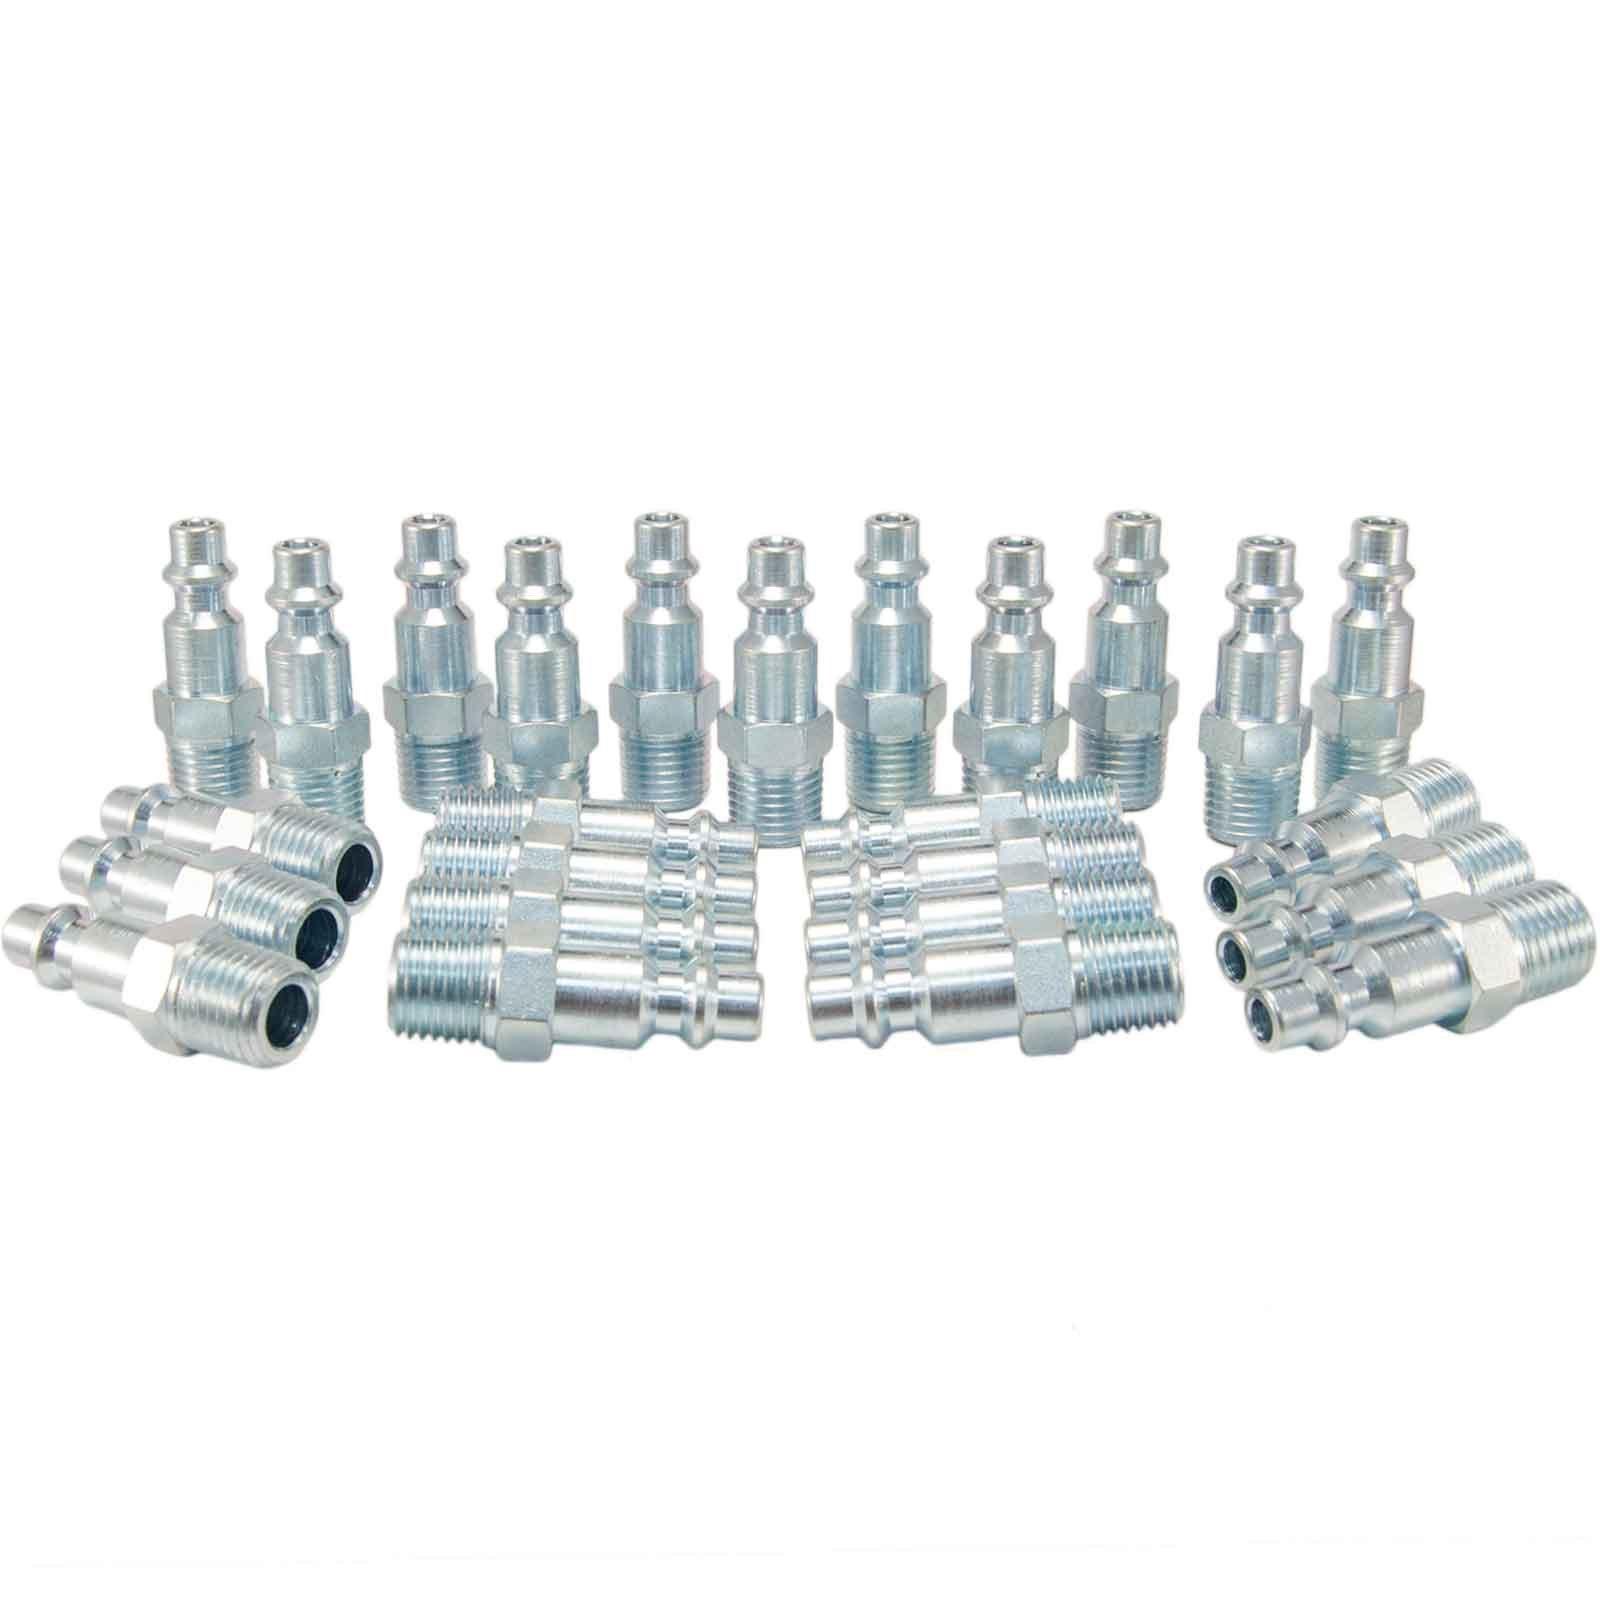 Foster 3 Series - Steel Plugs 25pc, 1/4'' Body, 1/4'' NPT - Industrial Interchange, I/M, MIL Spec,